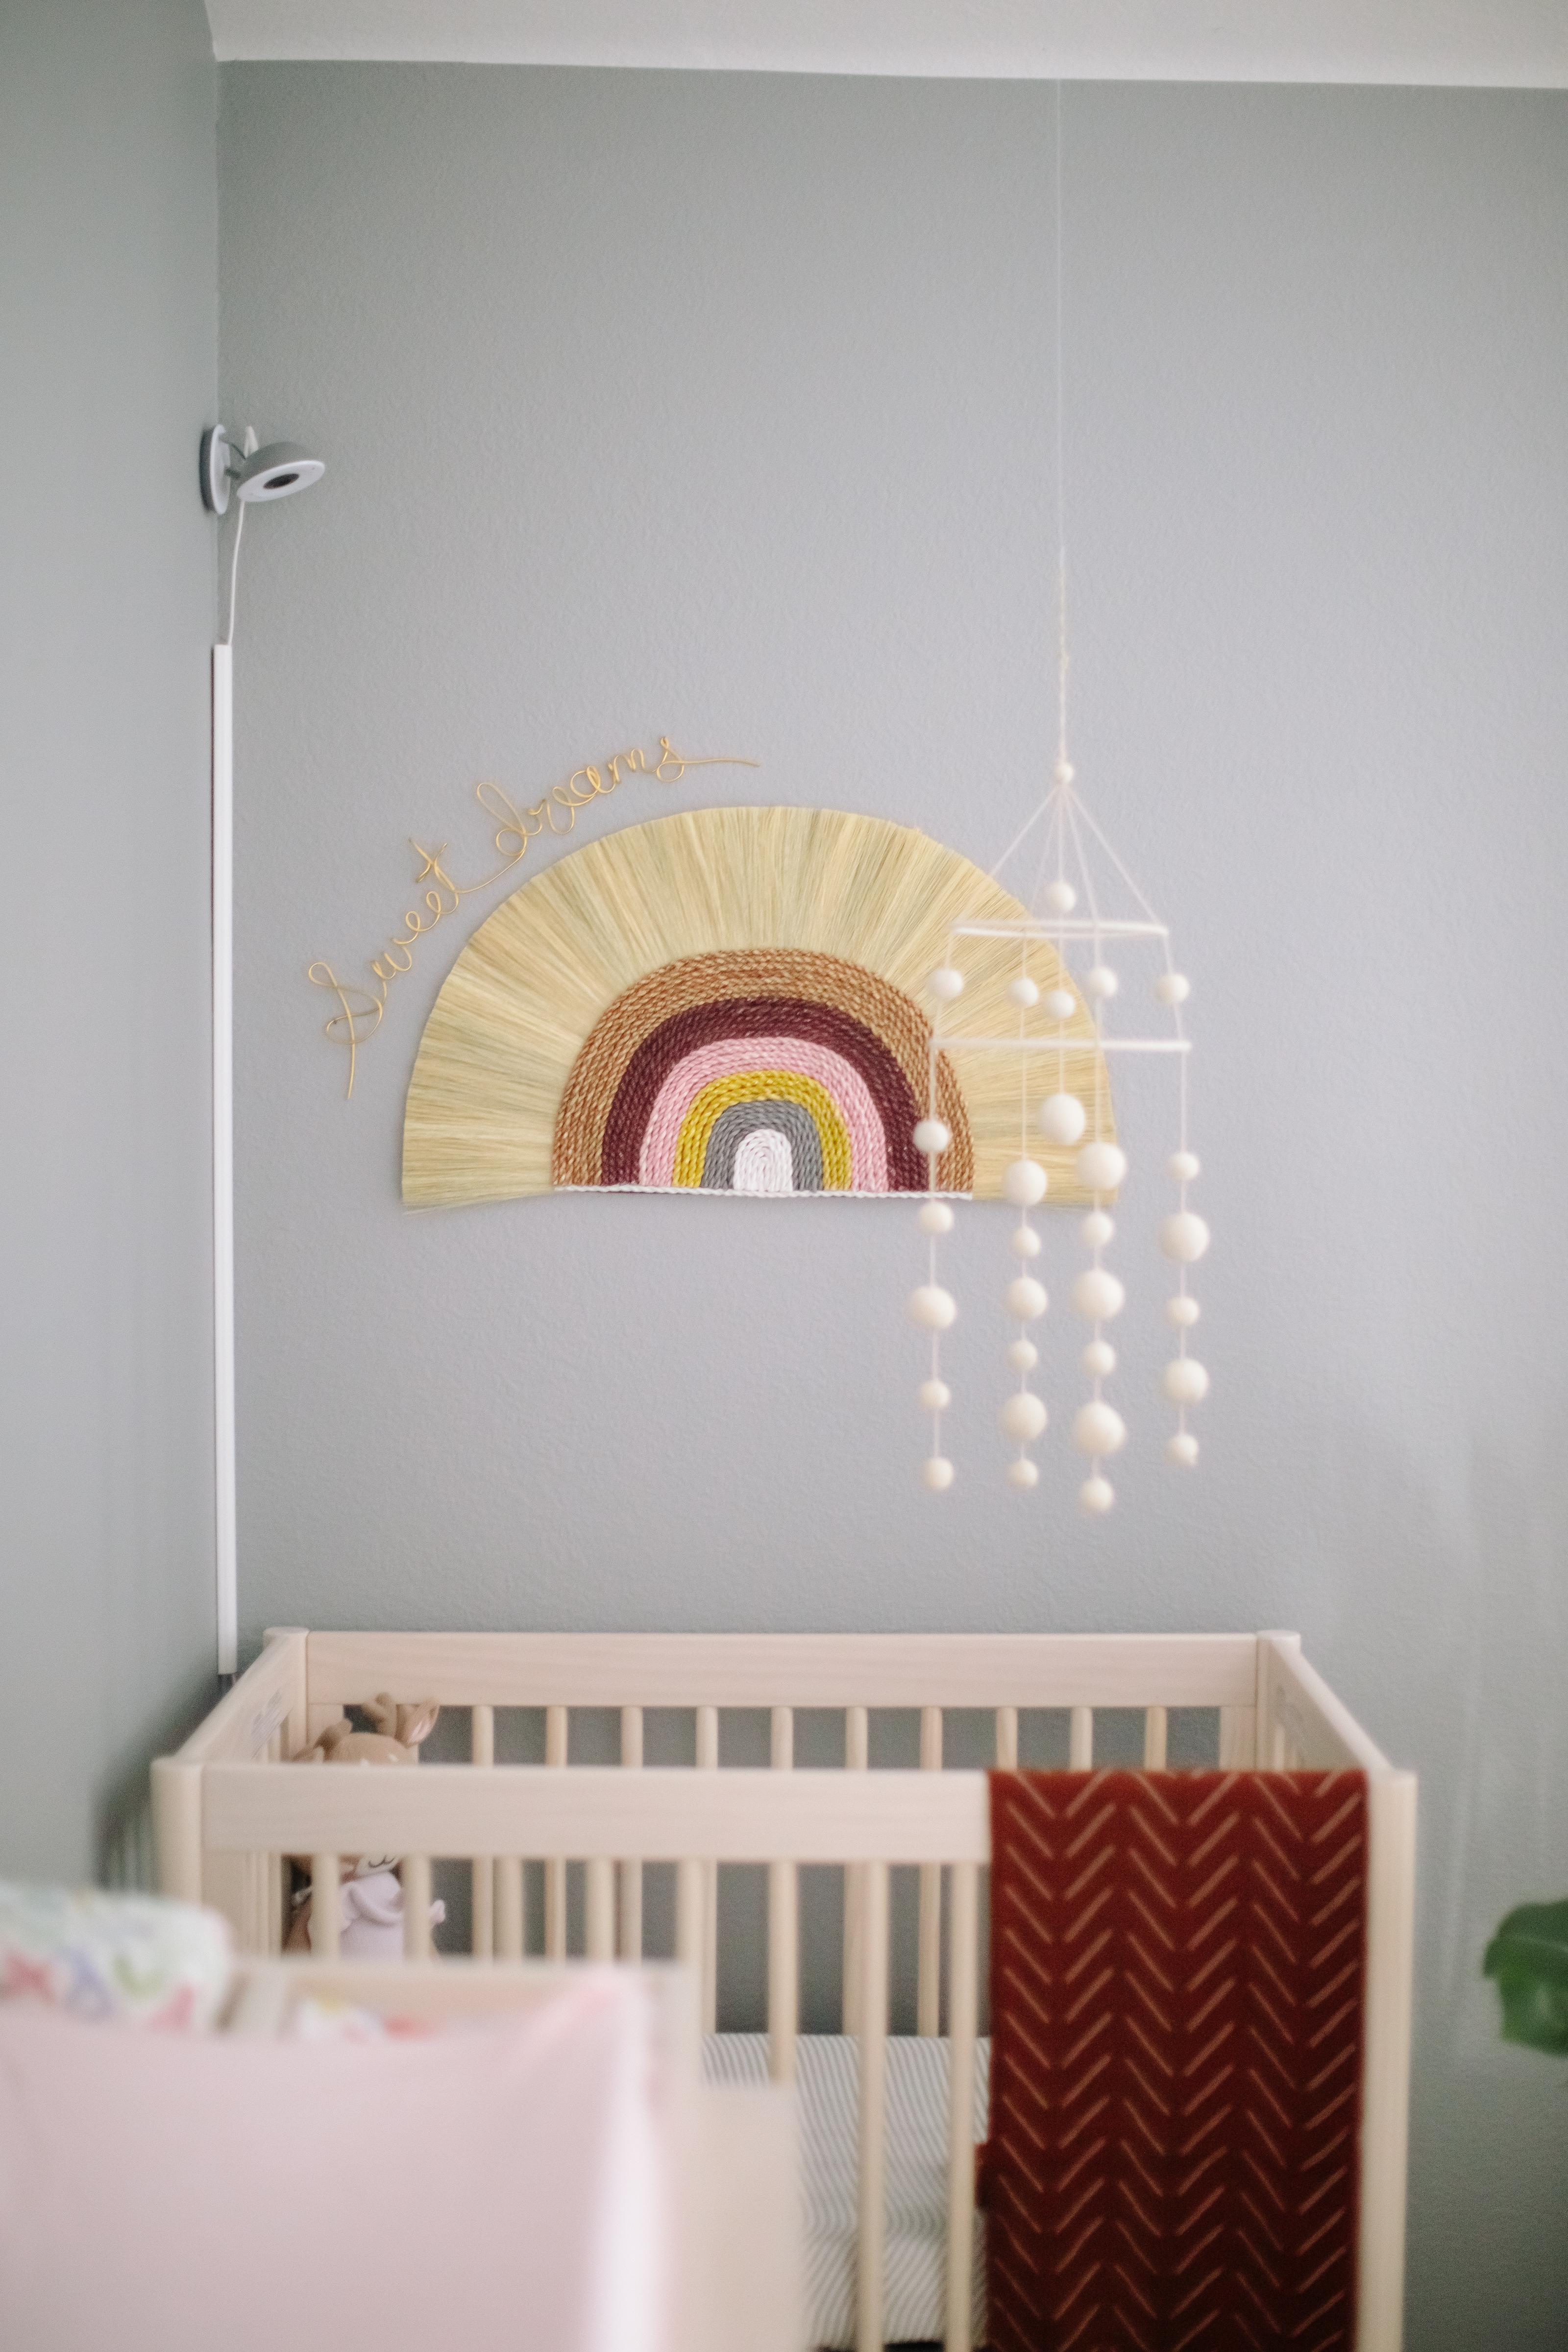 Boho Rainbow Wall Hanging with Felt Ball Mobile in Nursery Nook